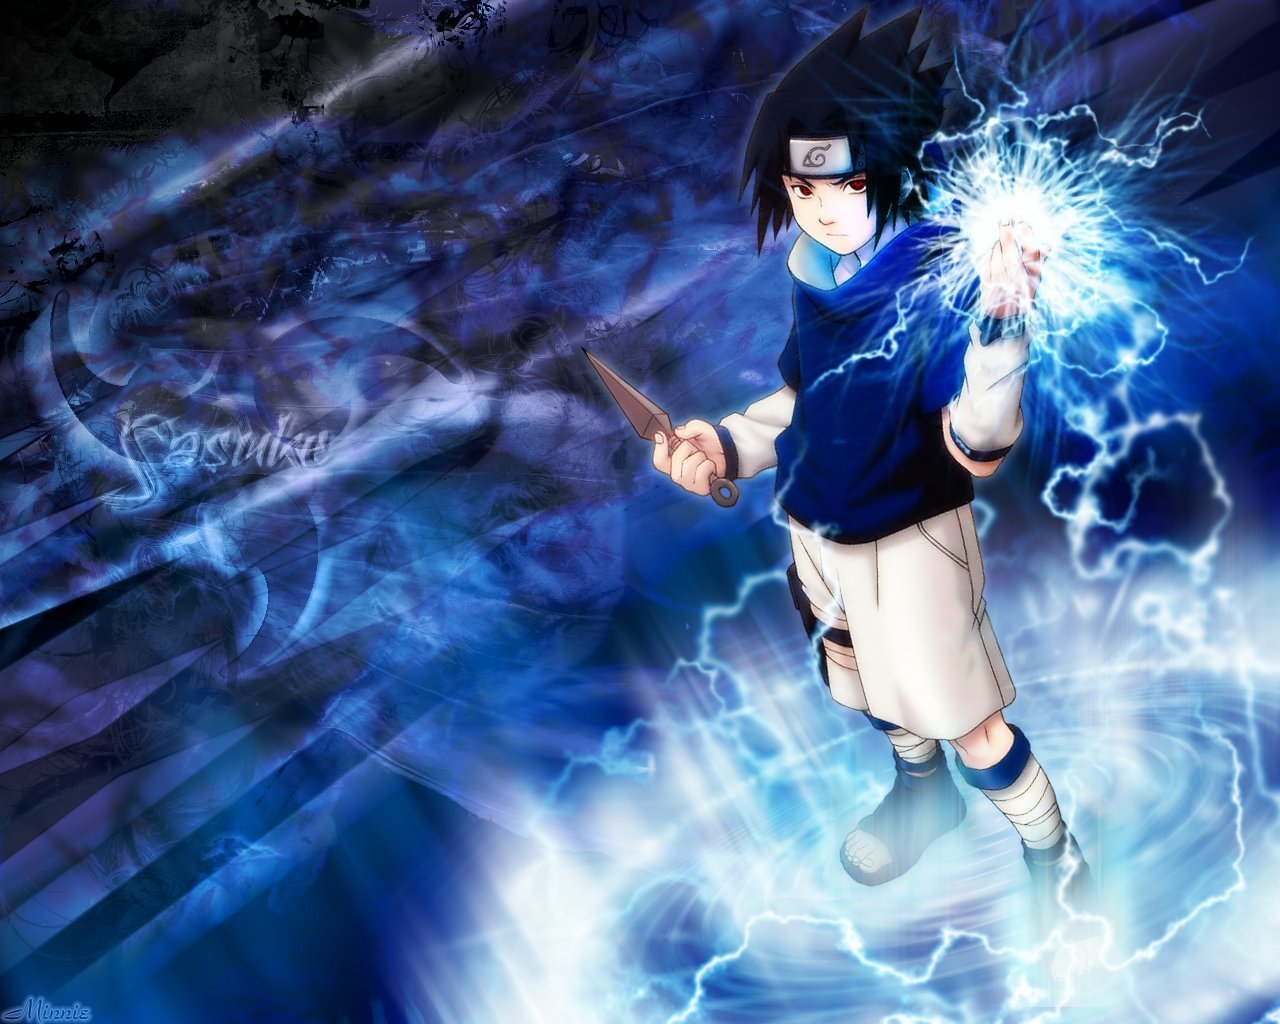 Uchiha Sasuke   Fotos e Imágenes en FOTOBLOG X